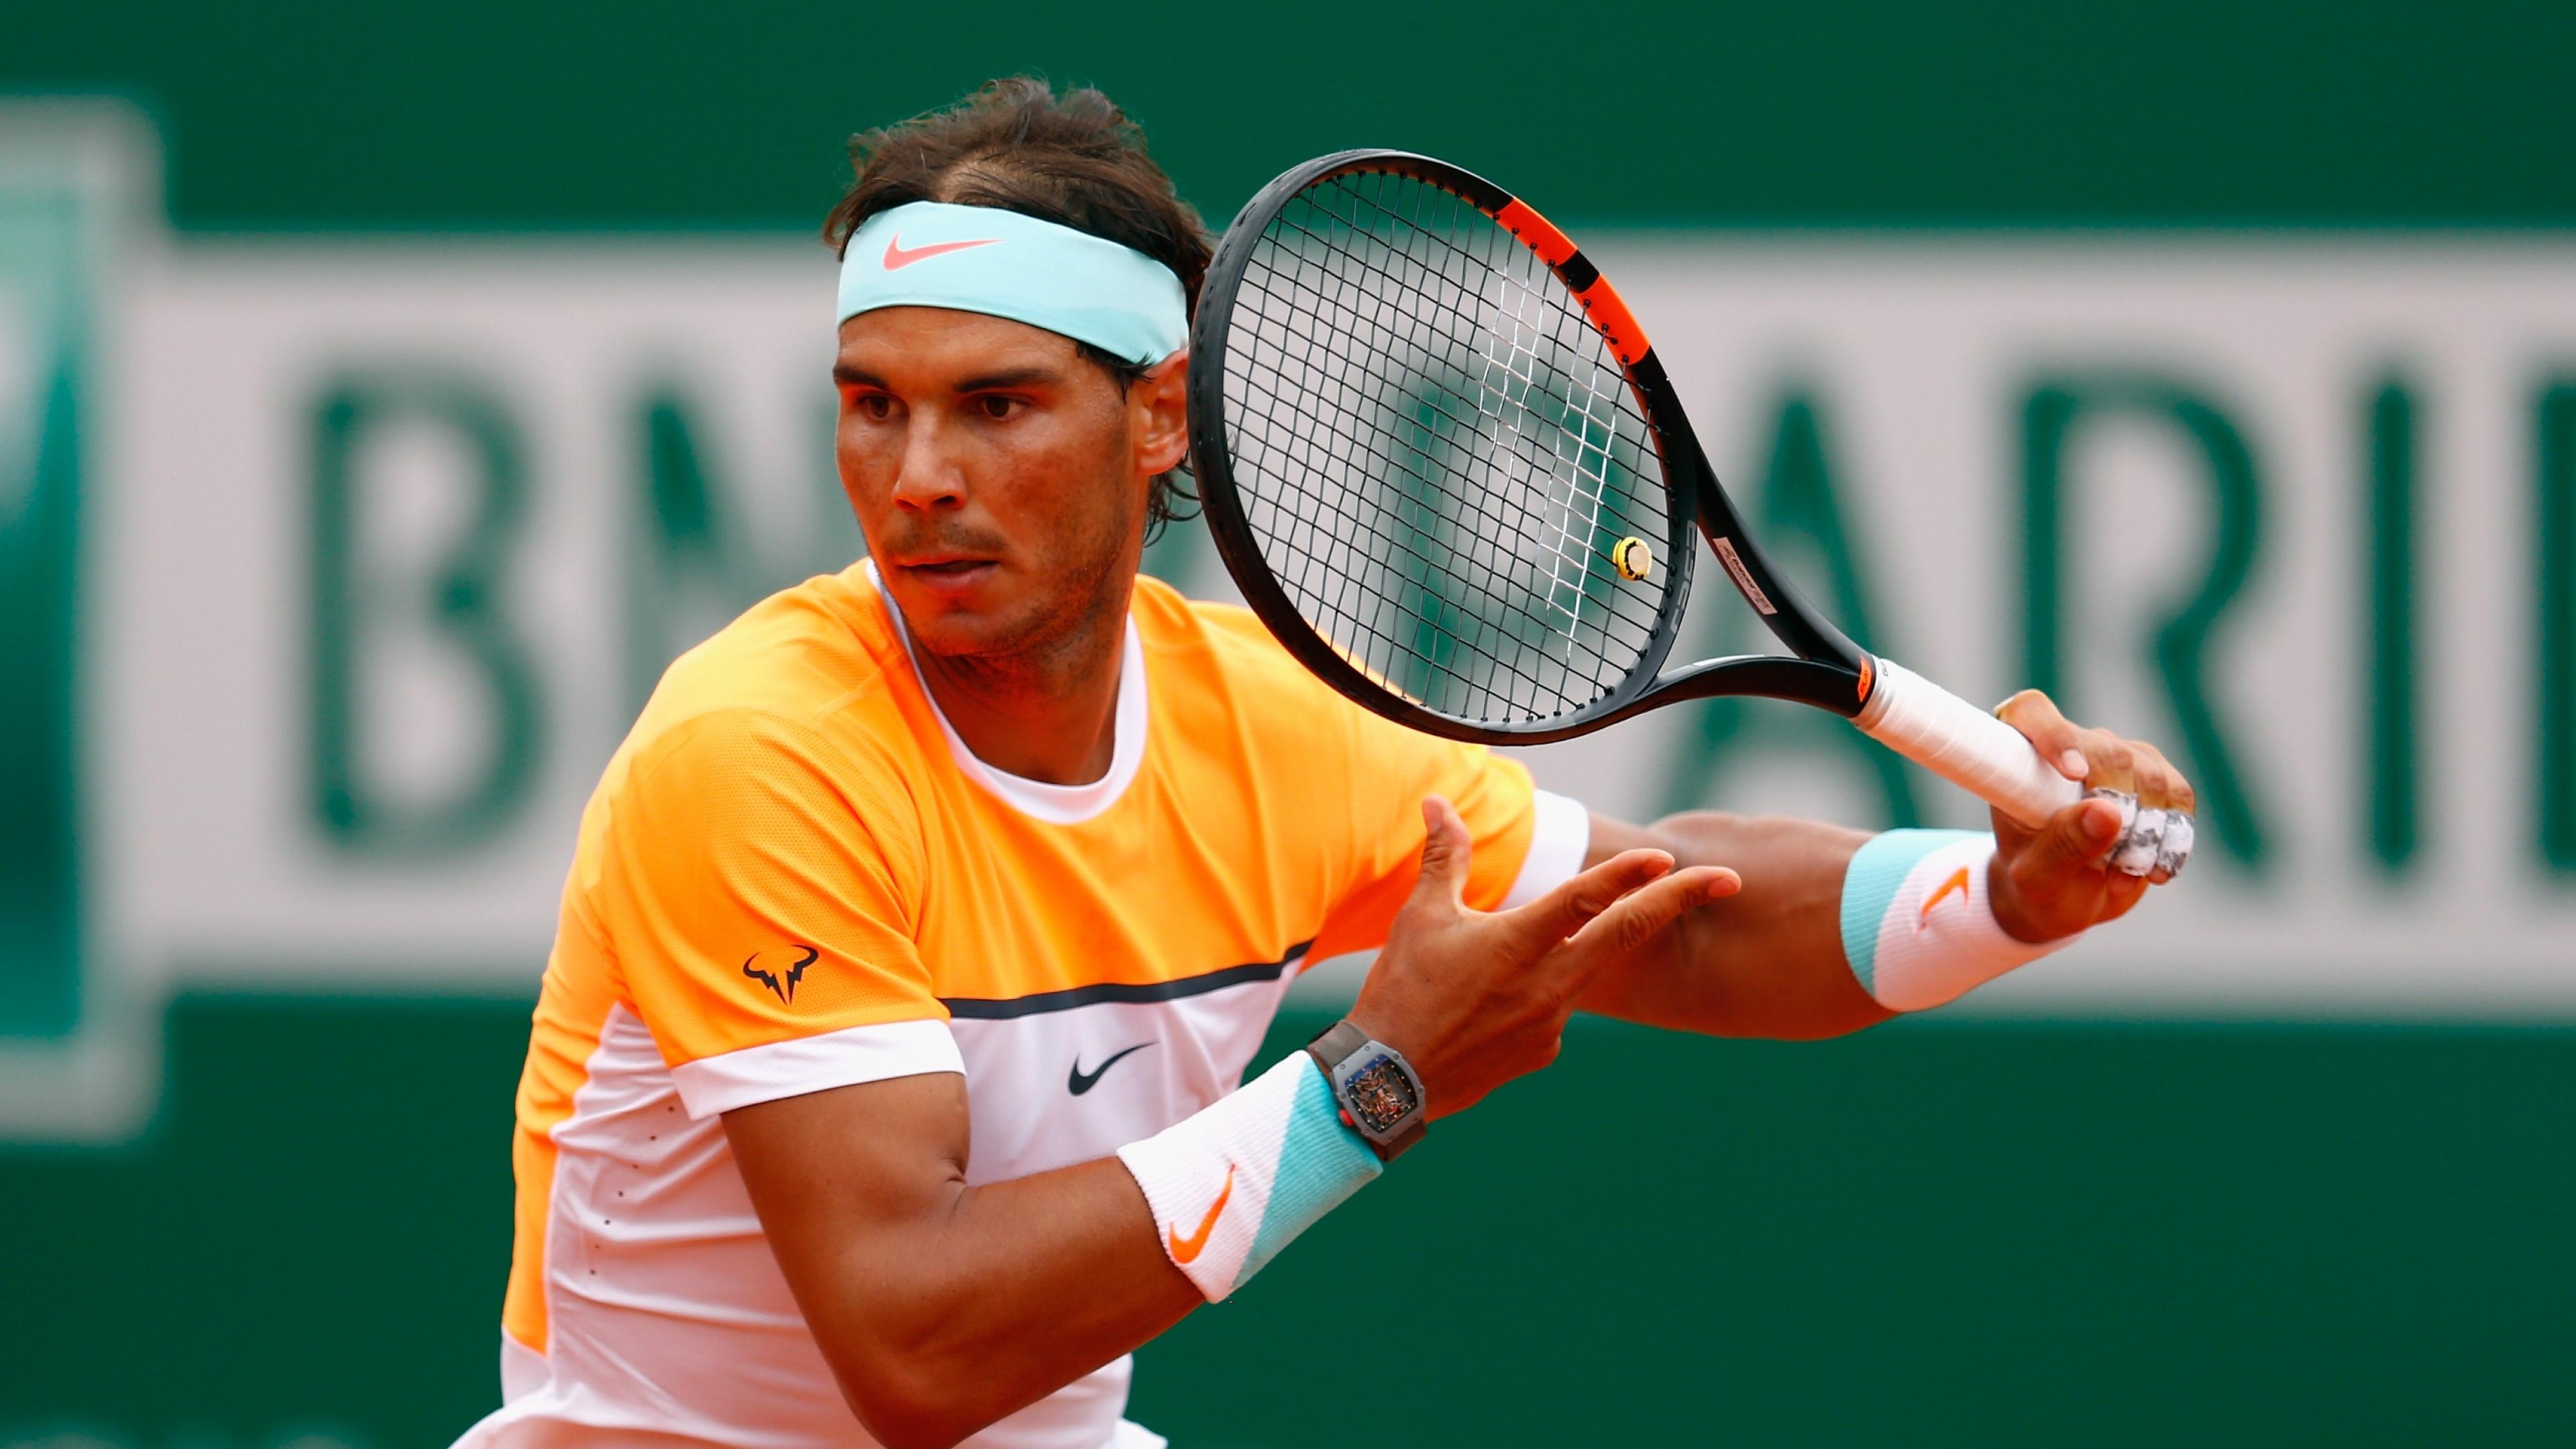 Rafael Nadal Wallpaper 16   3840 X 2160 stmednet 3840x2160